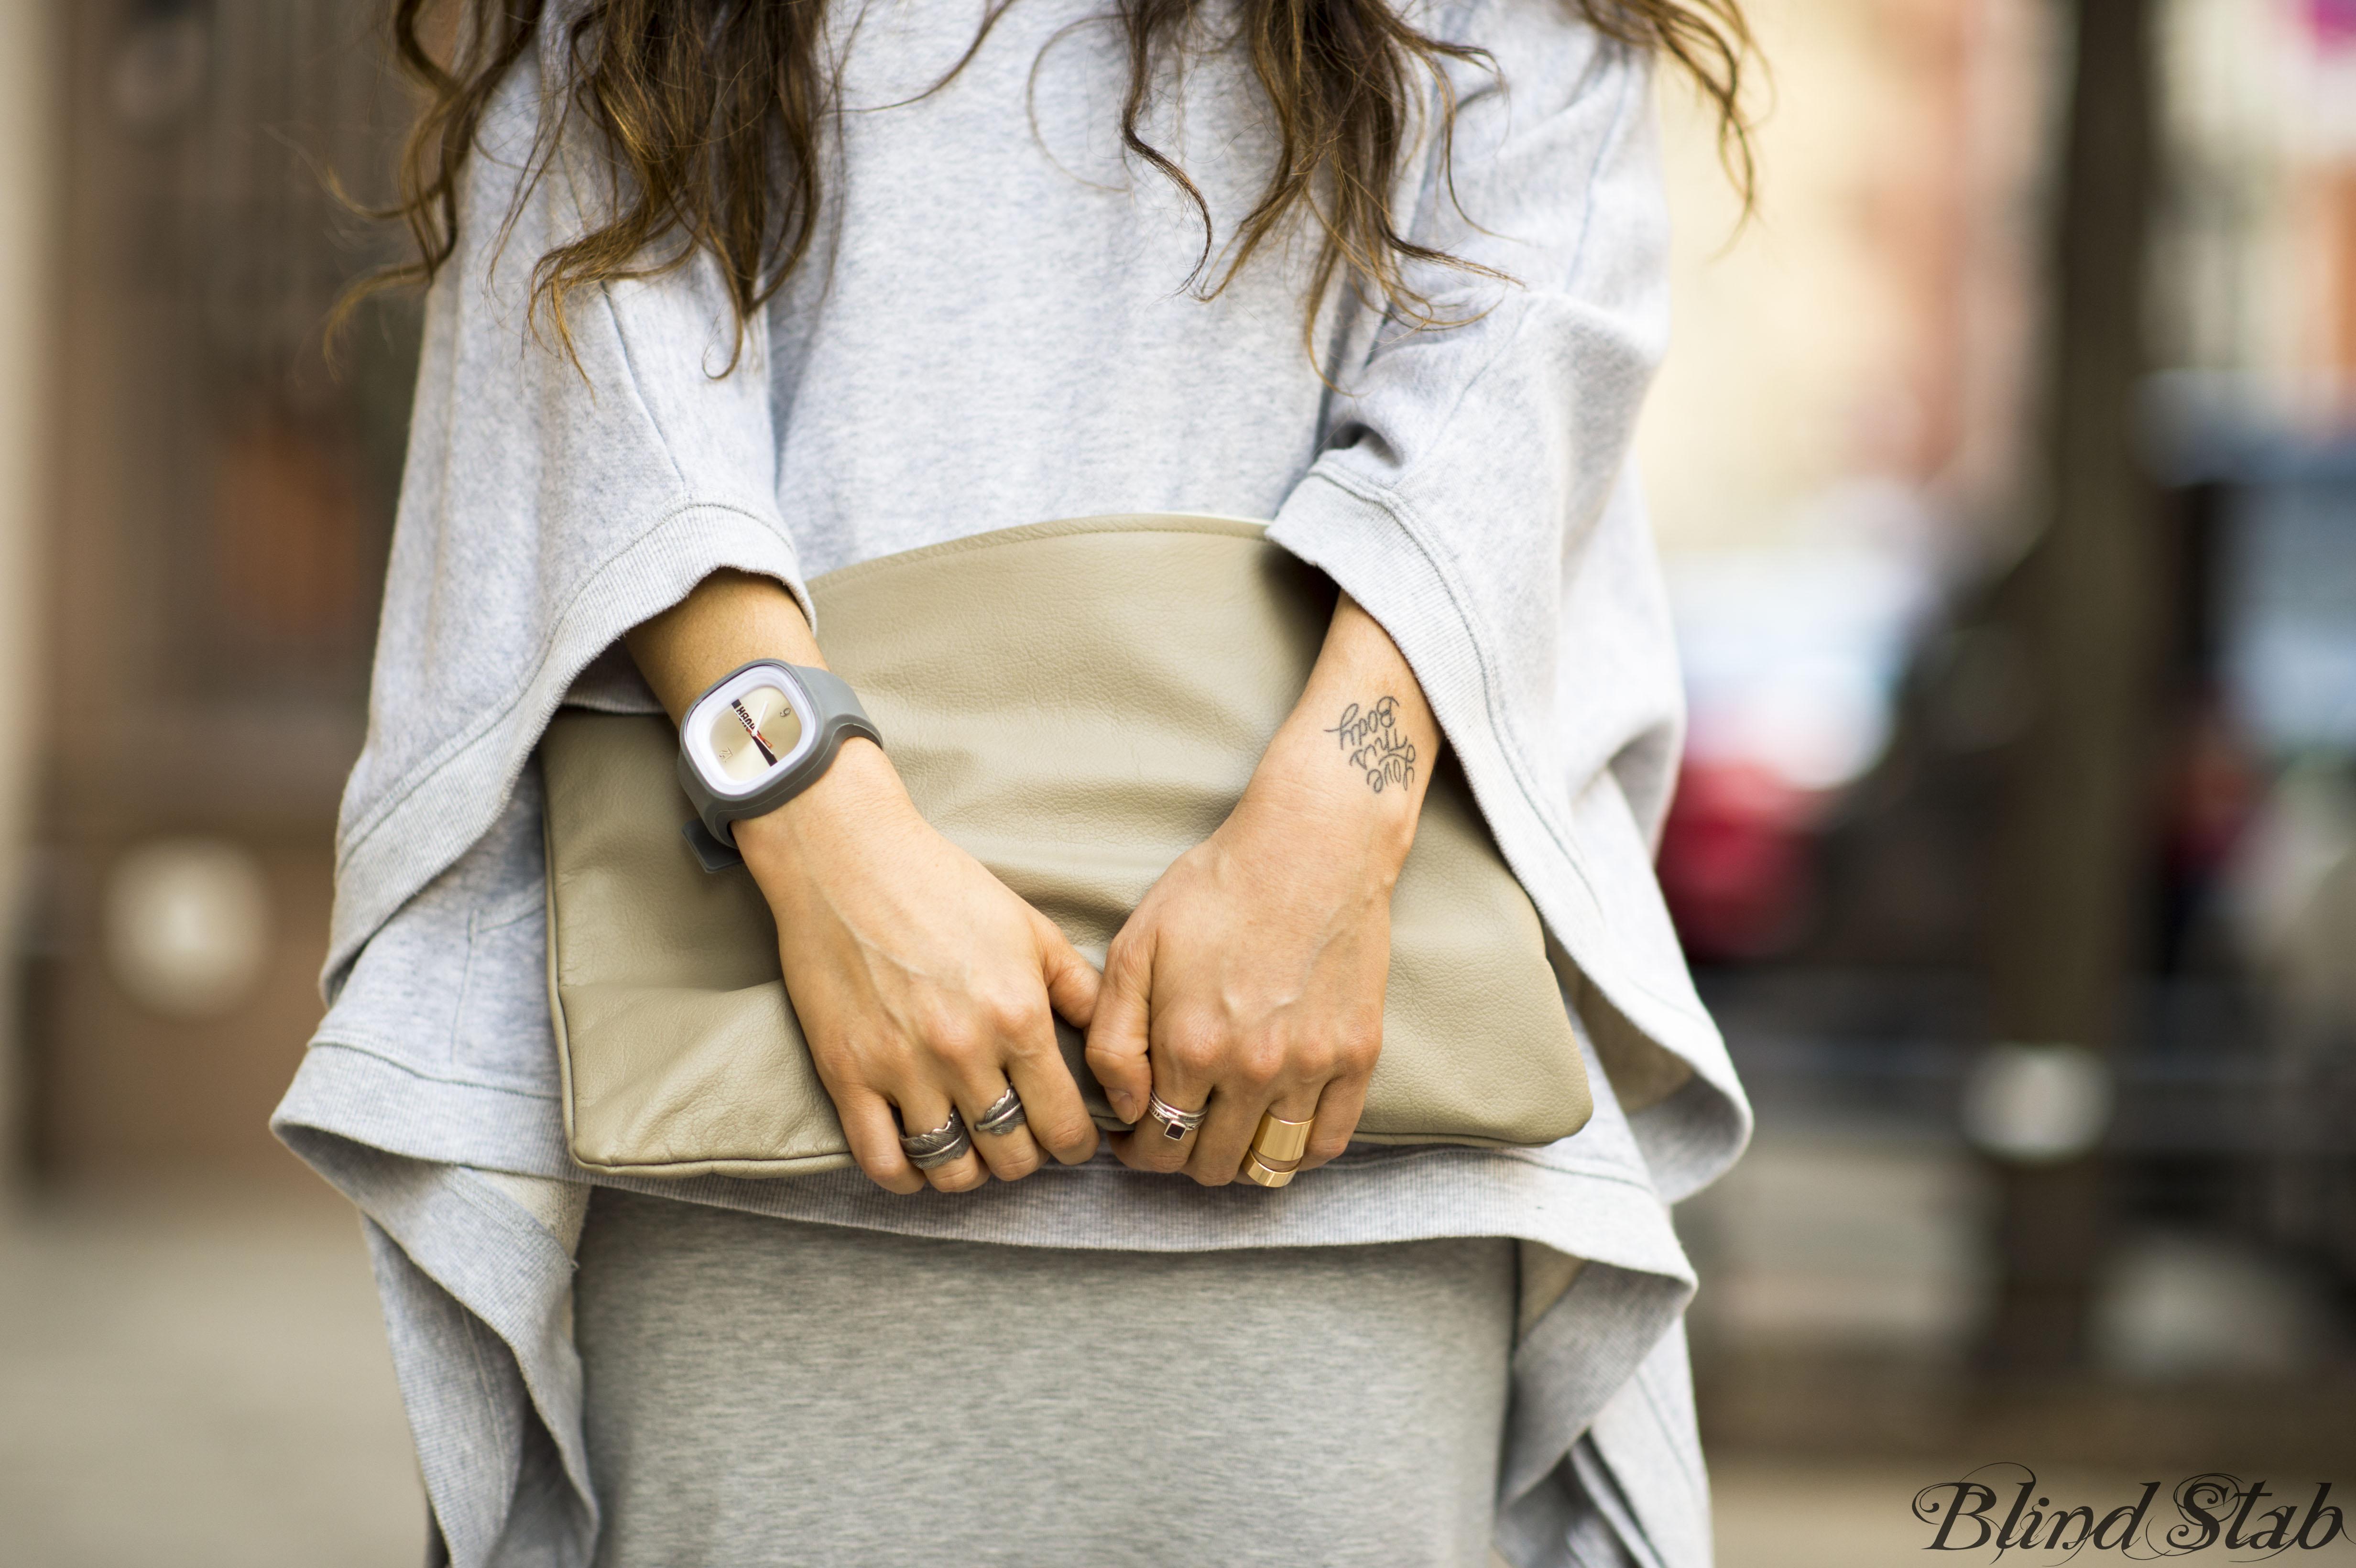 Wrist-Tattoo-American-Apparel-Gray-Clutch